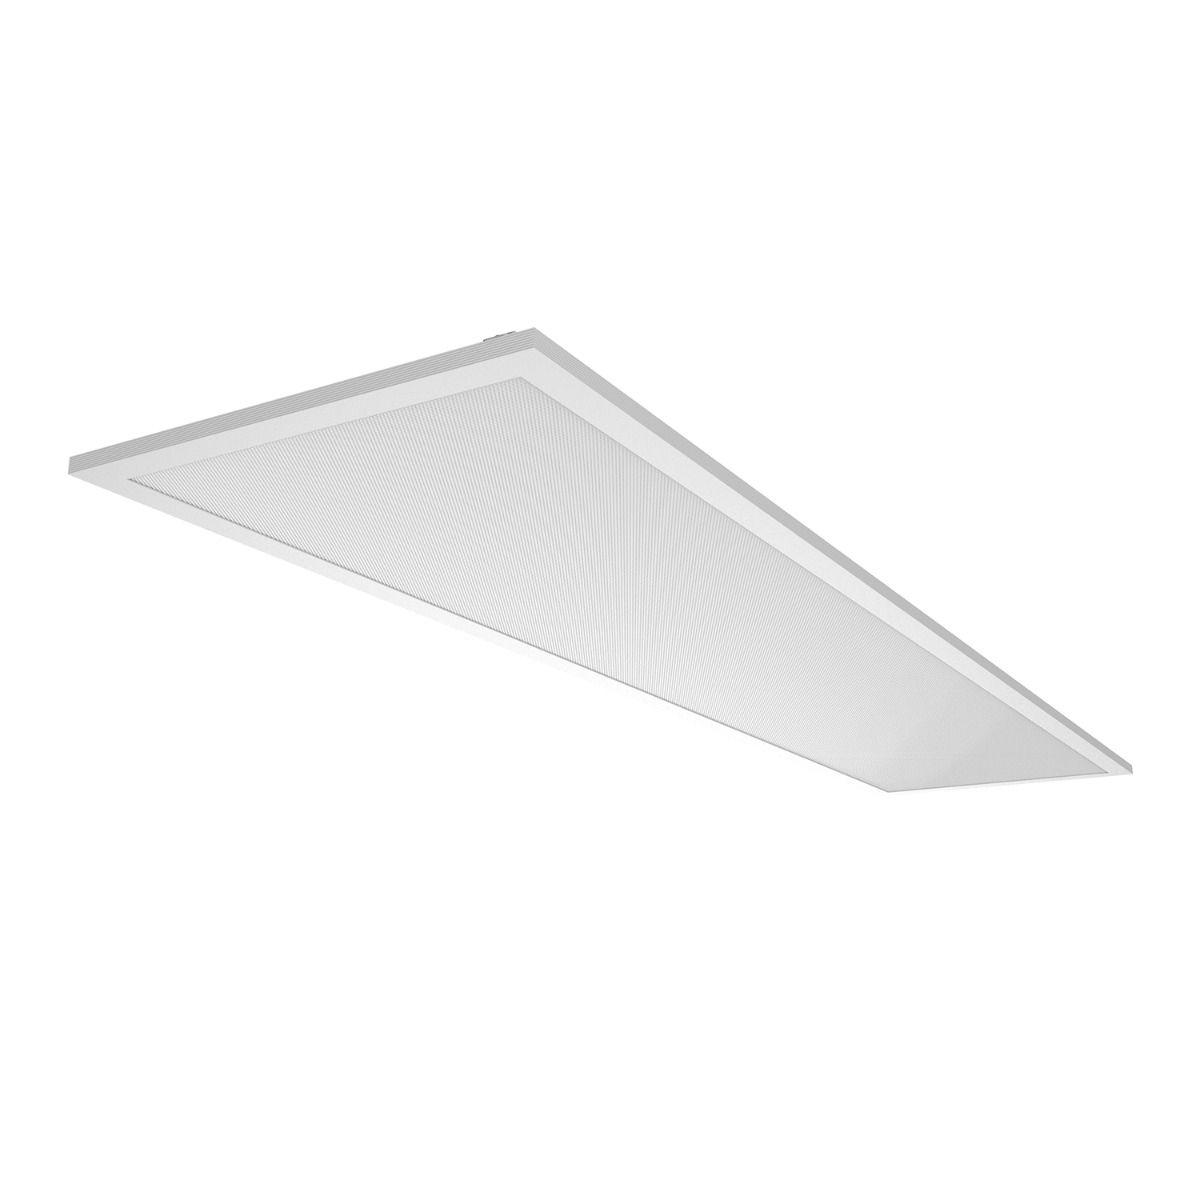 Noxion LED Panel Delta Pro V3 Highlum 36W 4000K 5500lm 30x120cm UGR <19 | Cool White - Replaces 2x36\W